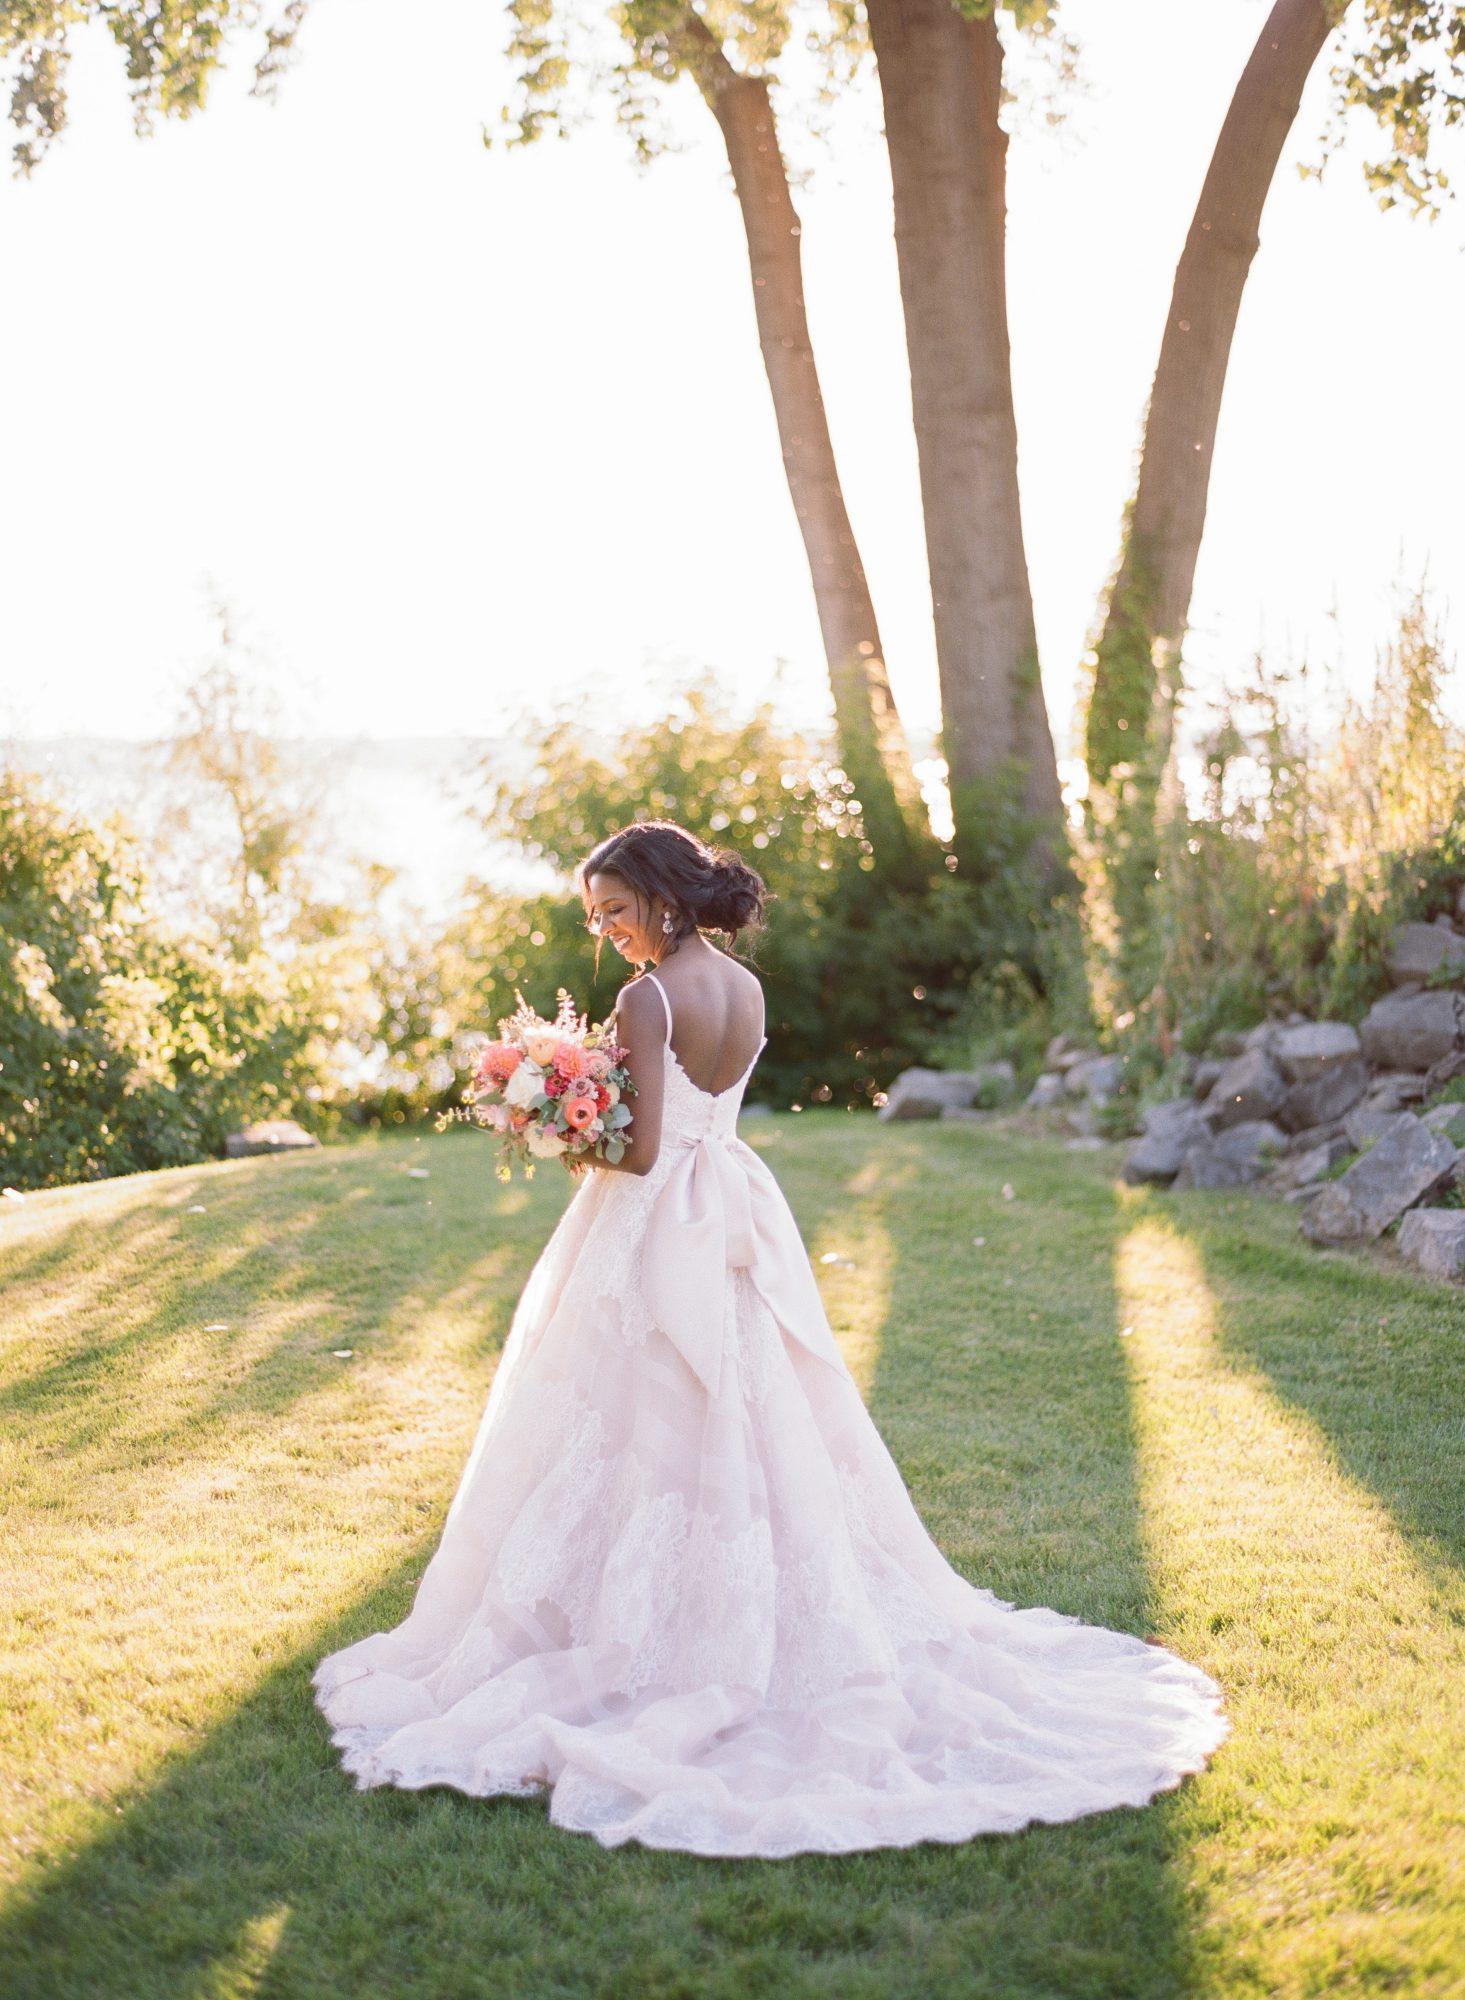 charlene jeremy wedding bride posing with bouquet